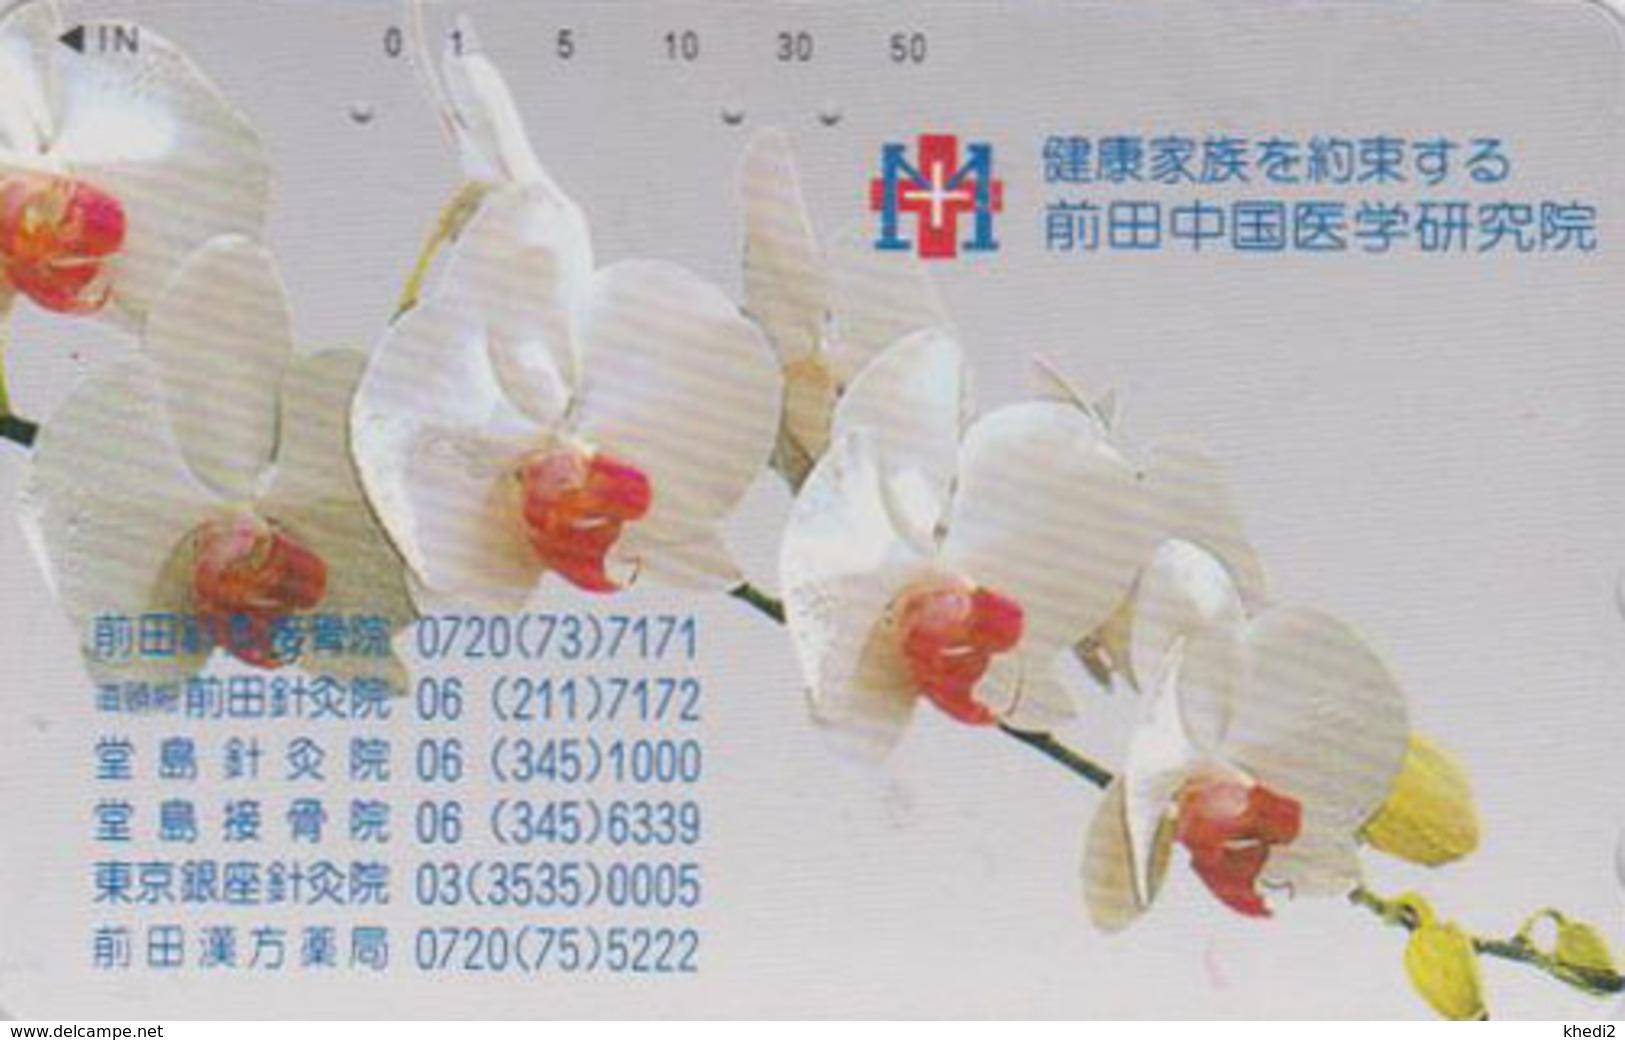 Télécarte Japon / 1100-016 A - Fleur - ORCHIDEE - ORCHID Flower Japan Phonecard ** MAEDA MEDICAL ** - ORQUIDEA - 2390 - Fleurs